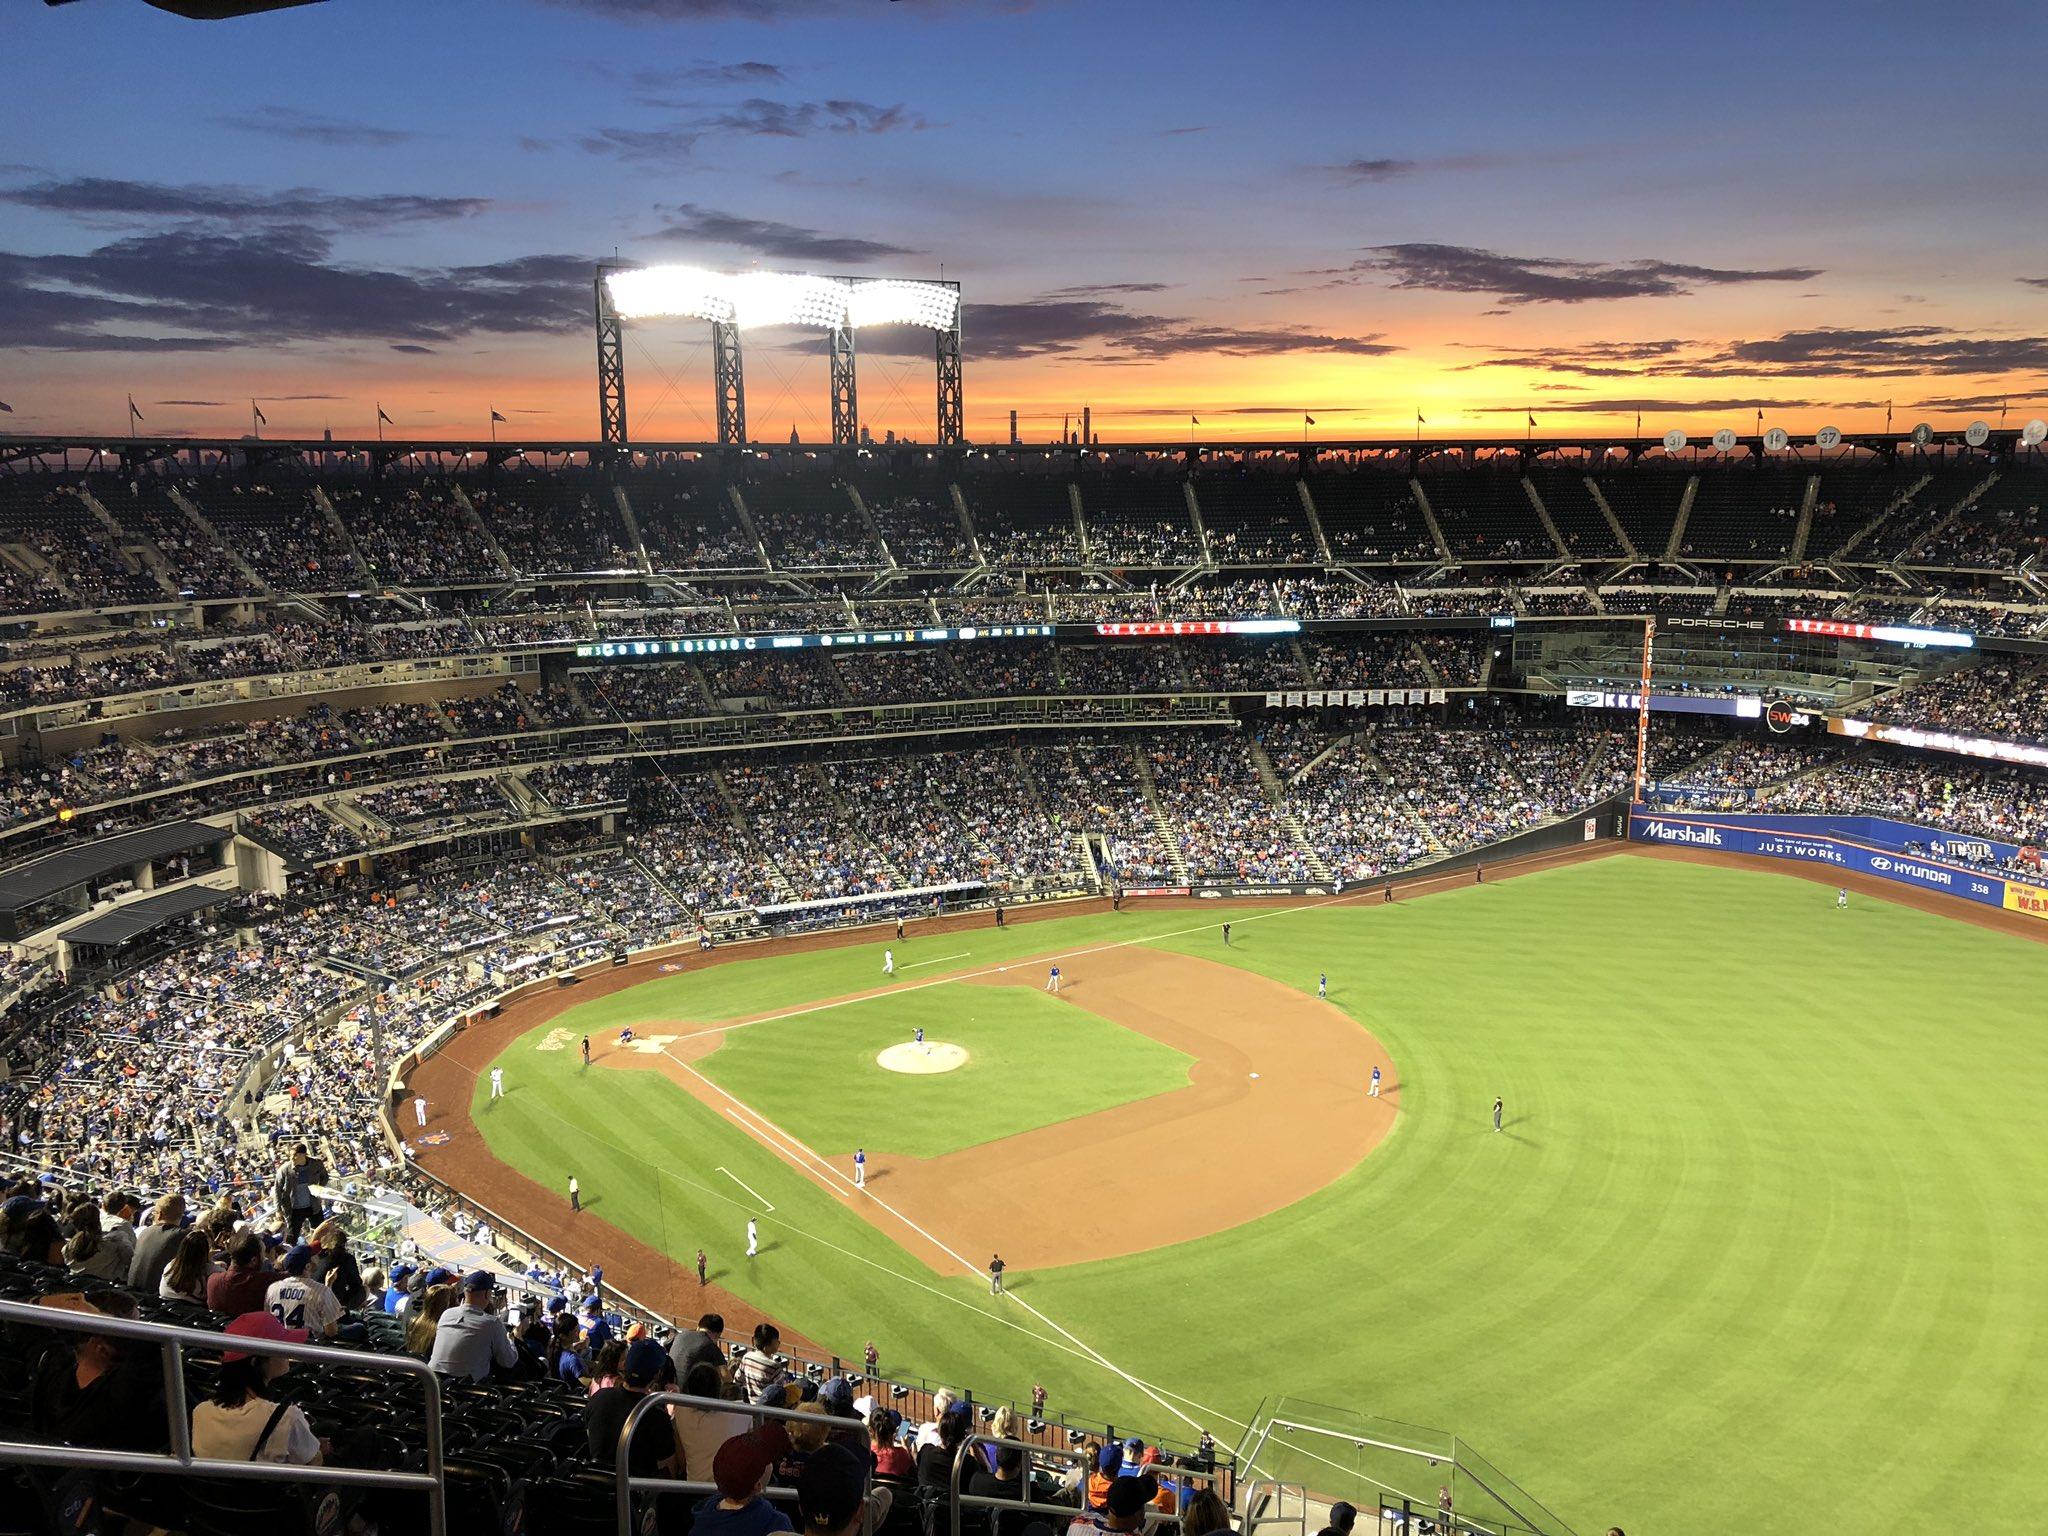 😍😍😍   #MLBNShowcase   @CitiField https://t.co/5yYsXxjWS3